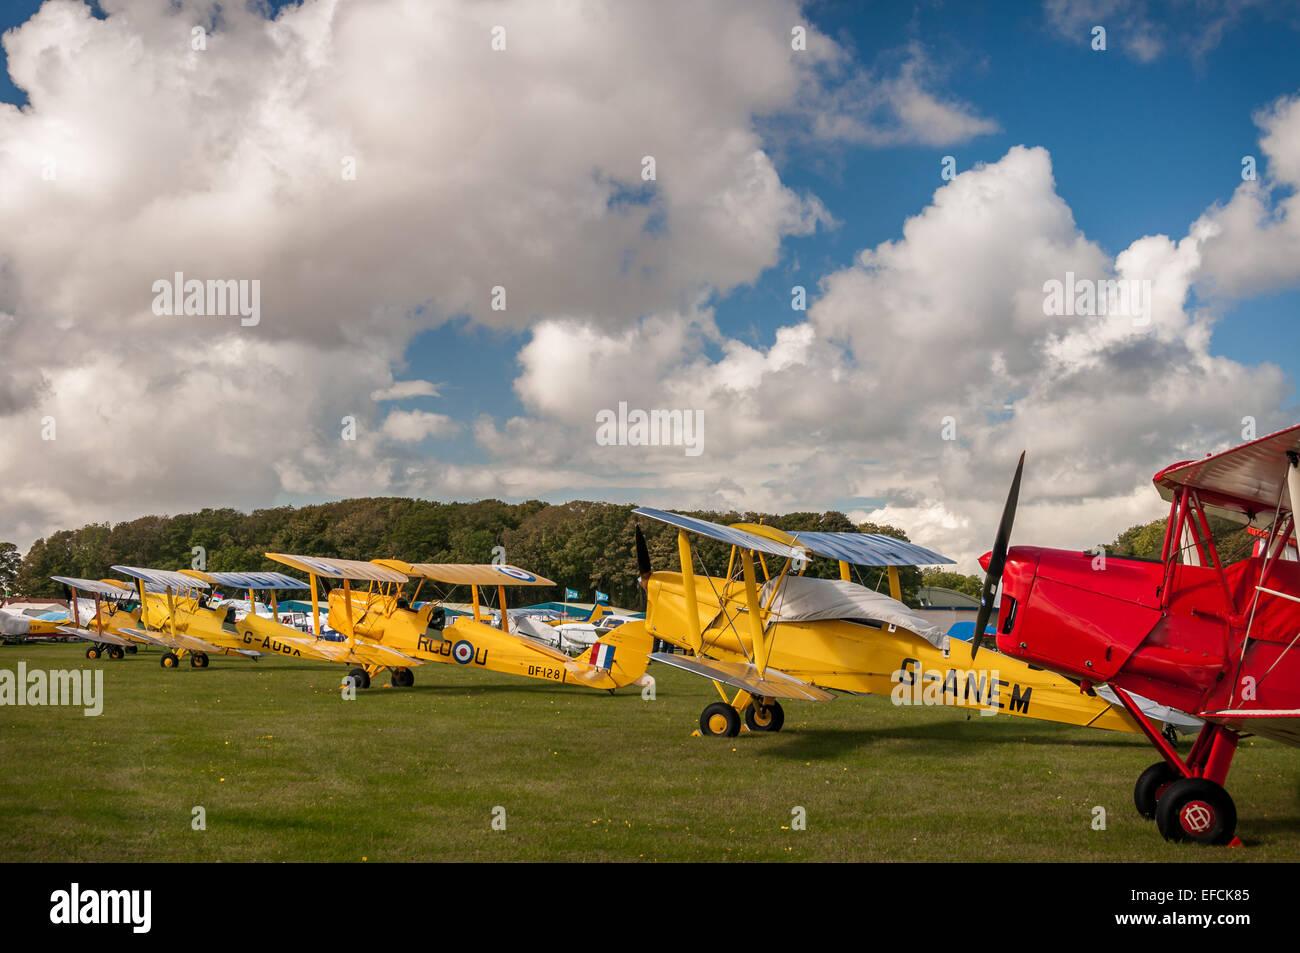 Line of De Havilland Tiger Moths, 1930s biplanes, at Kemble Airshow - Stock Image